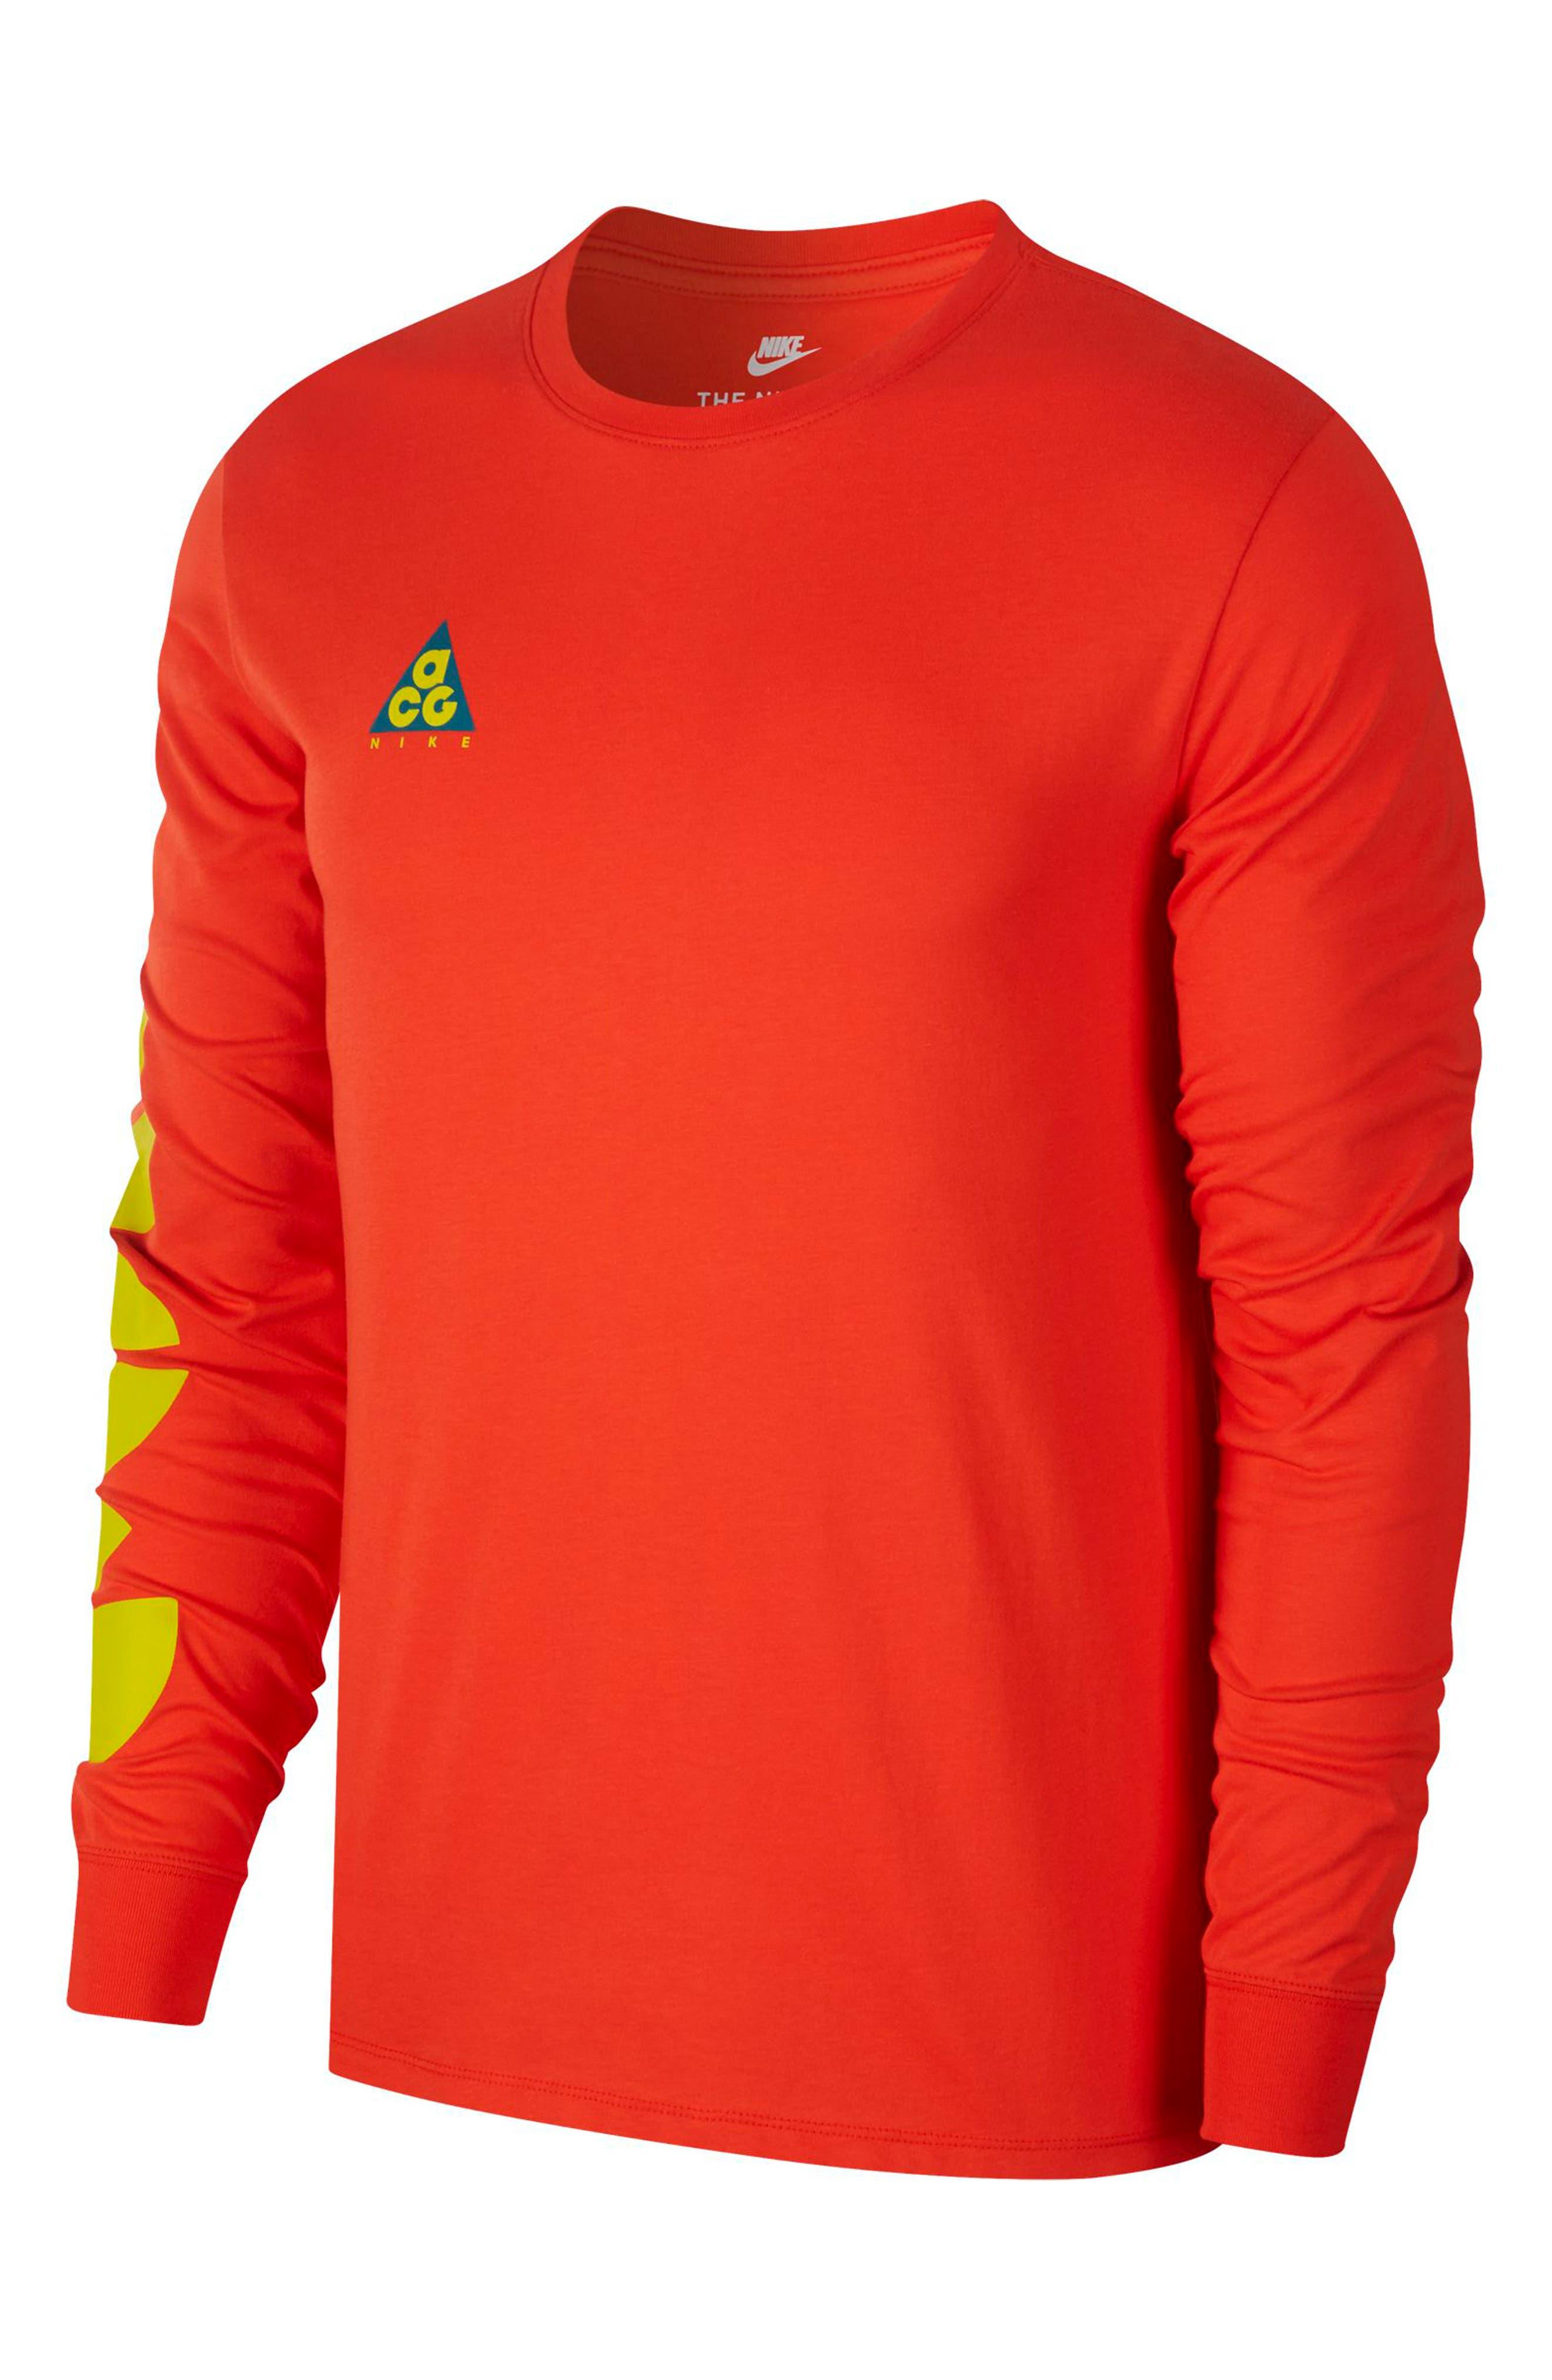 Nike Nsw Acg Graphic T-Shirt, Red